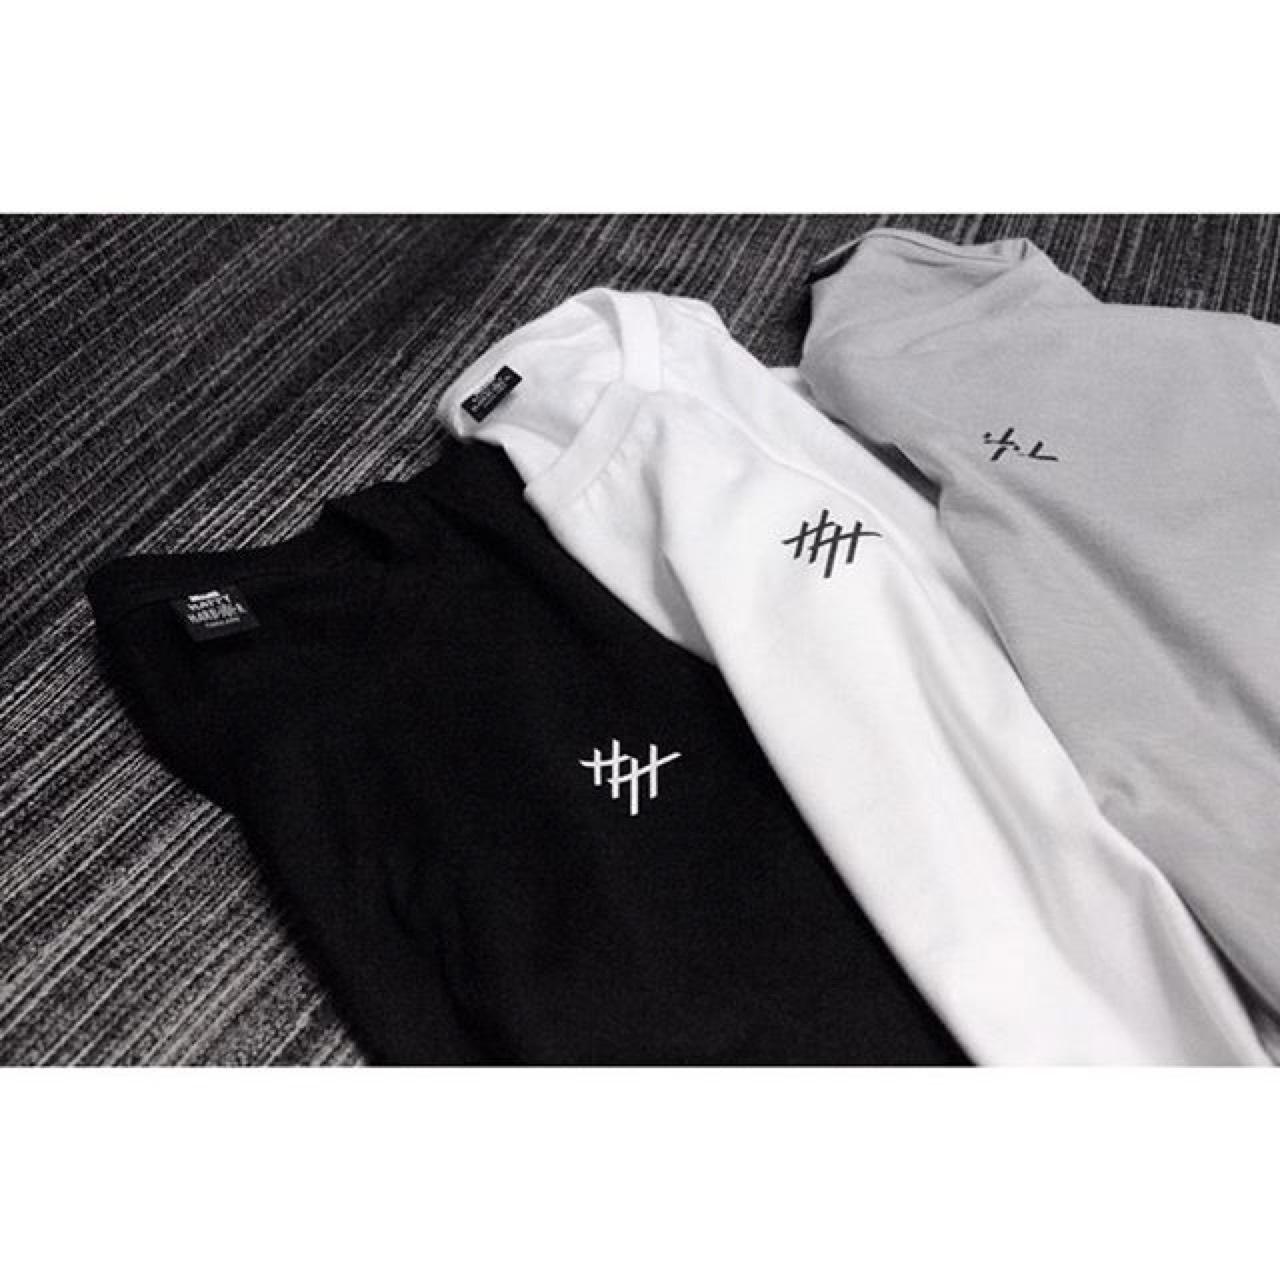 basic,tee,tshirt,hahar,thehappyharbor